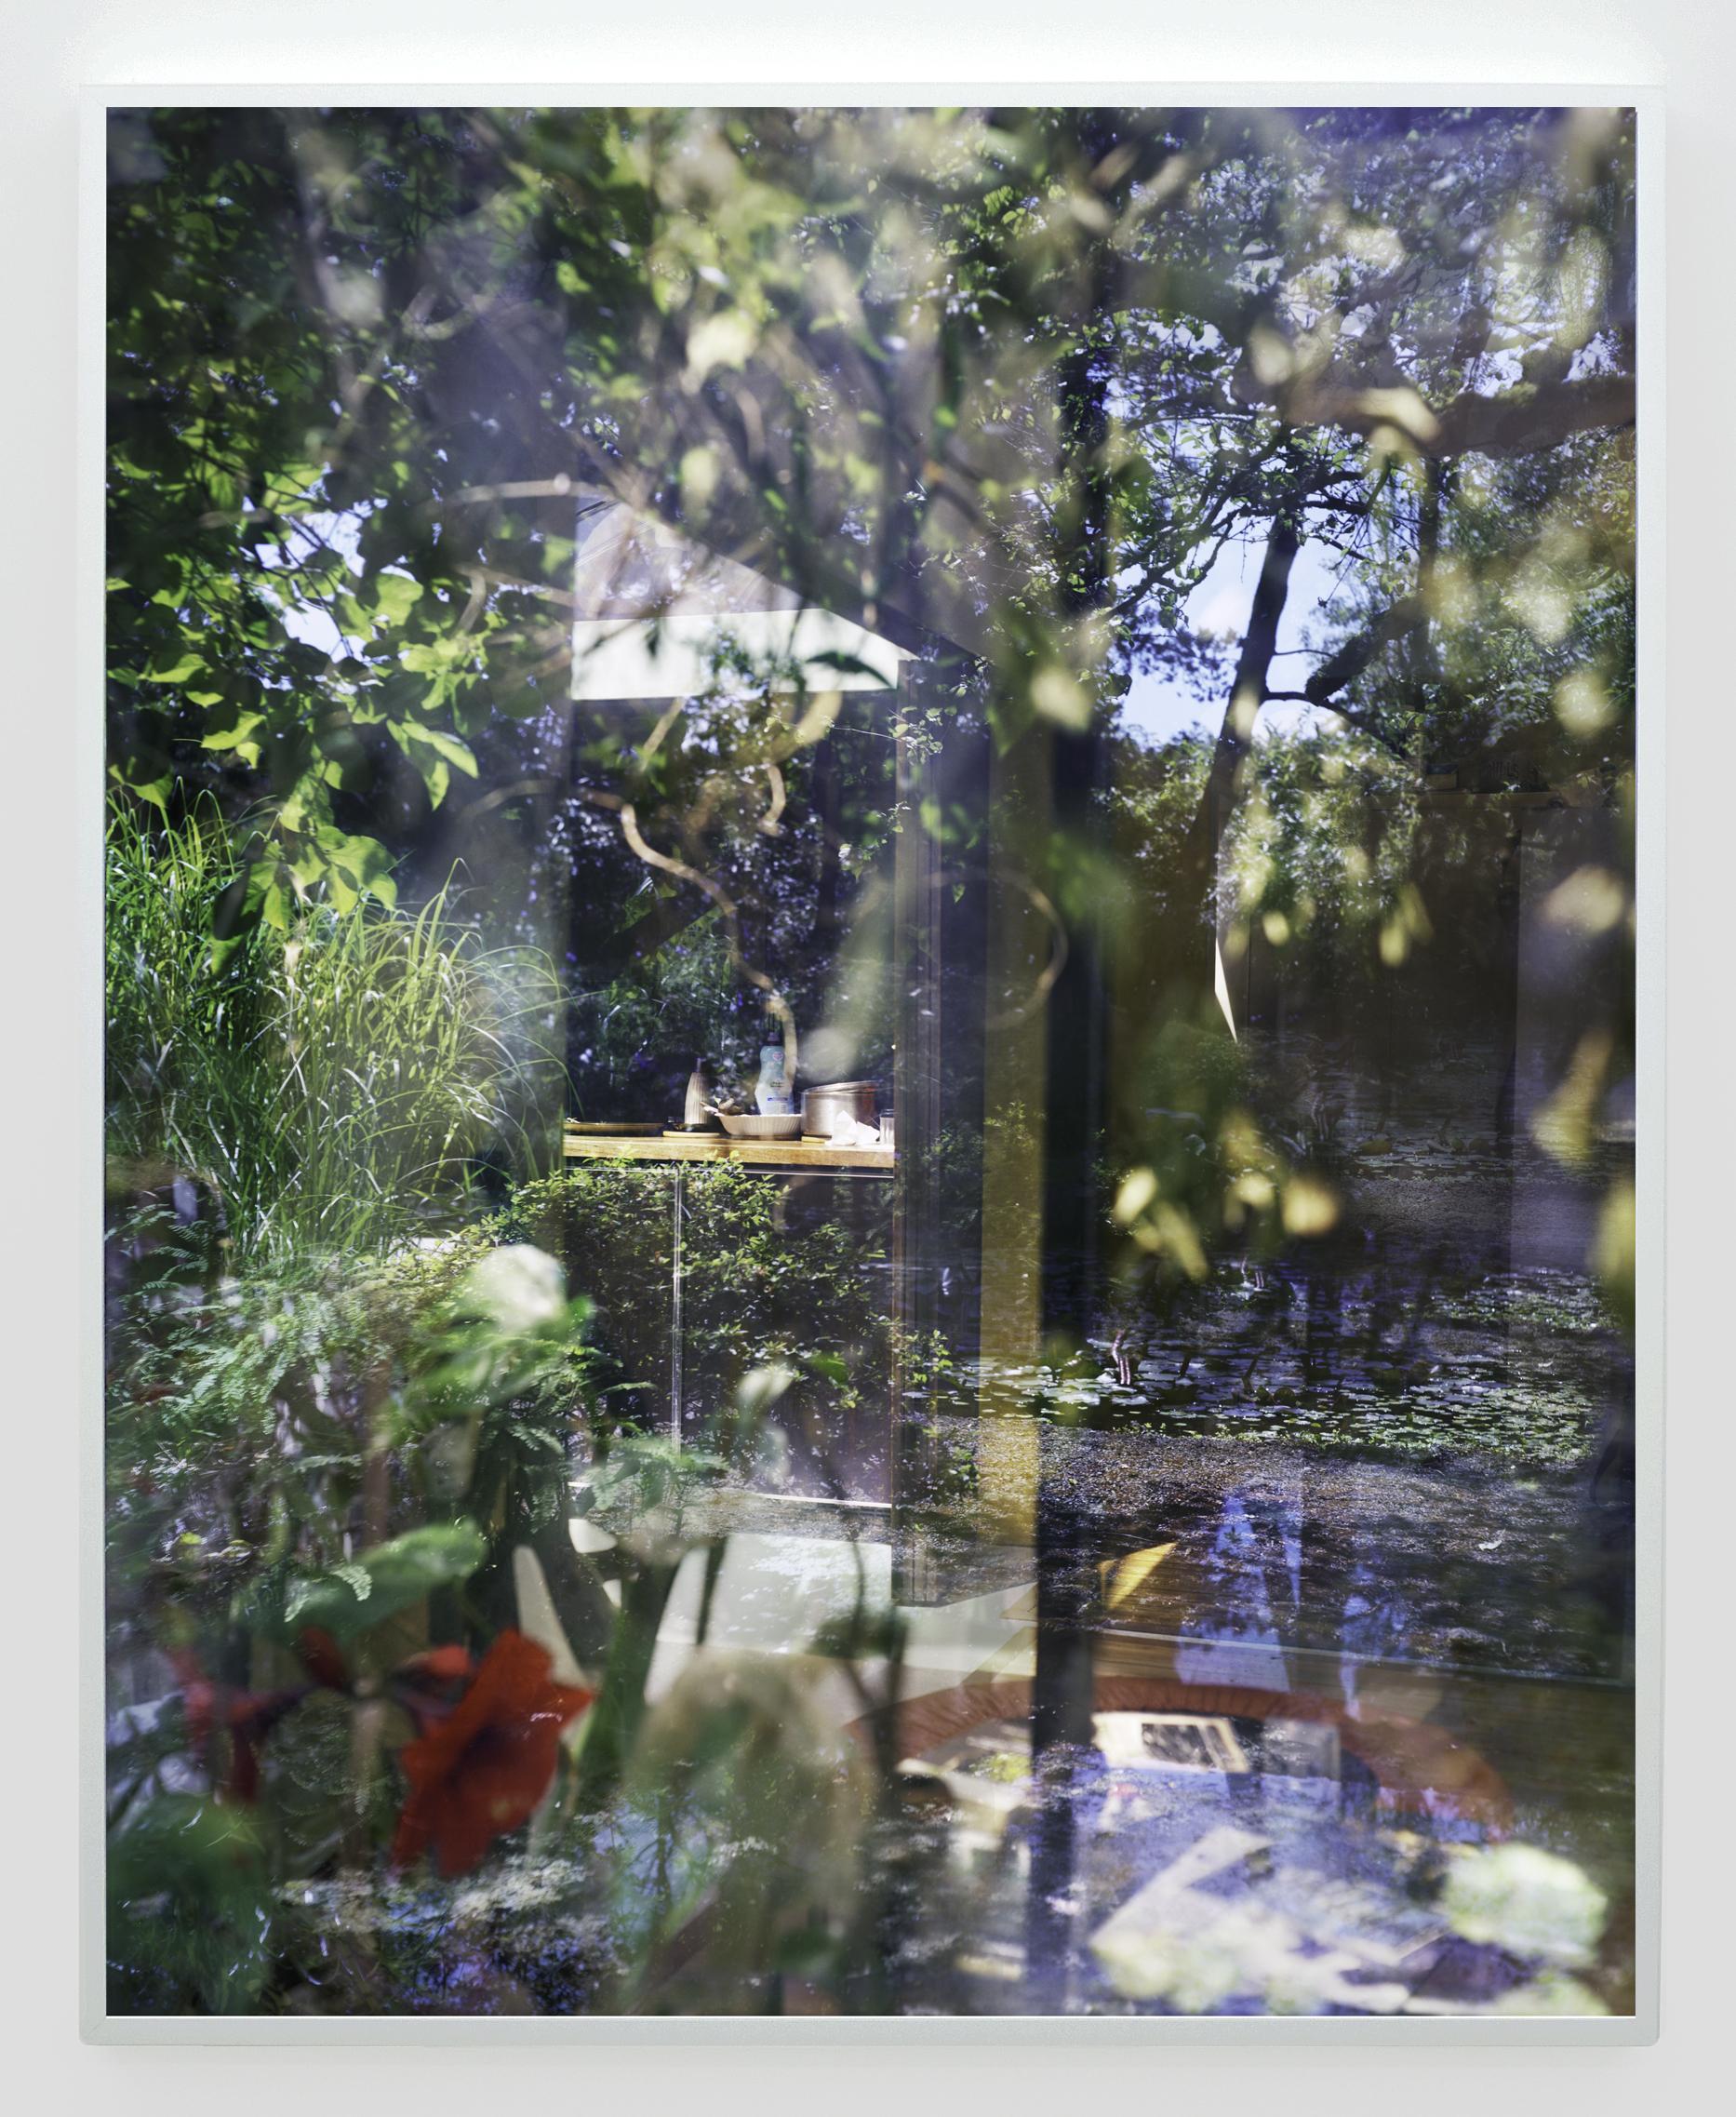 "Lorna Bauer,  Cobblestone Gardens #4 (after Arthur Erickson) , Edition of 3 + 1 AP, 2016, inkjet print, 50"" x 40"" (127 x 102 cm)"